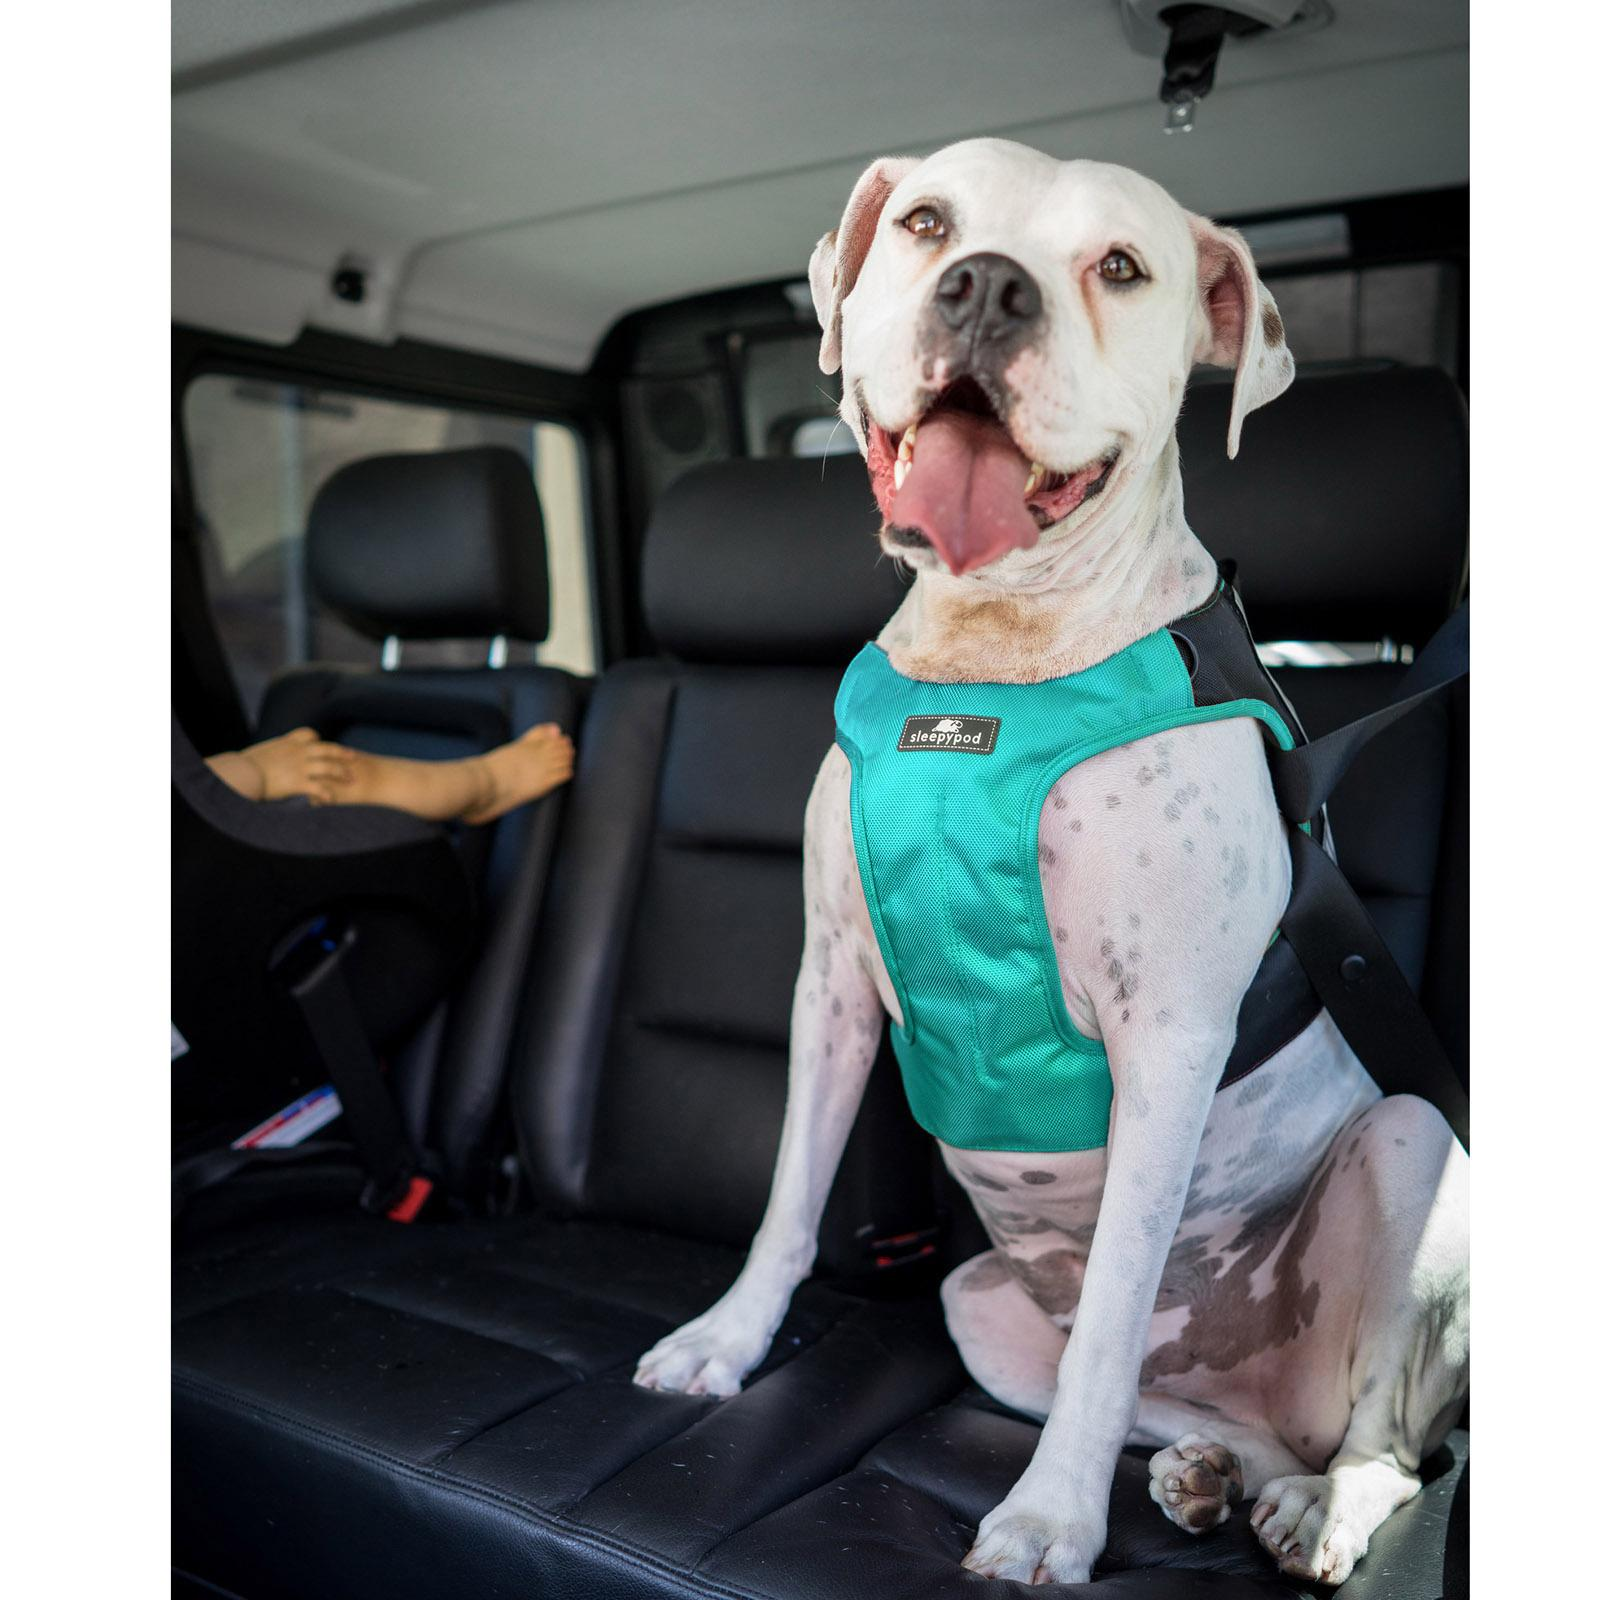 Clickit Terrain Car Safety Dog Harness By Sleepypod - Robin Egg Blue